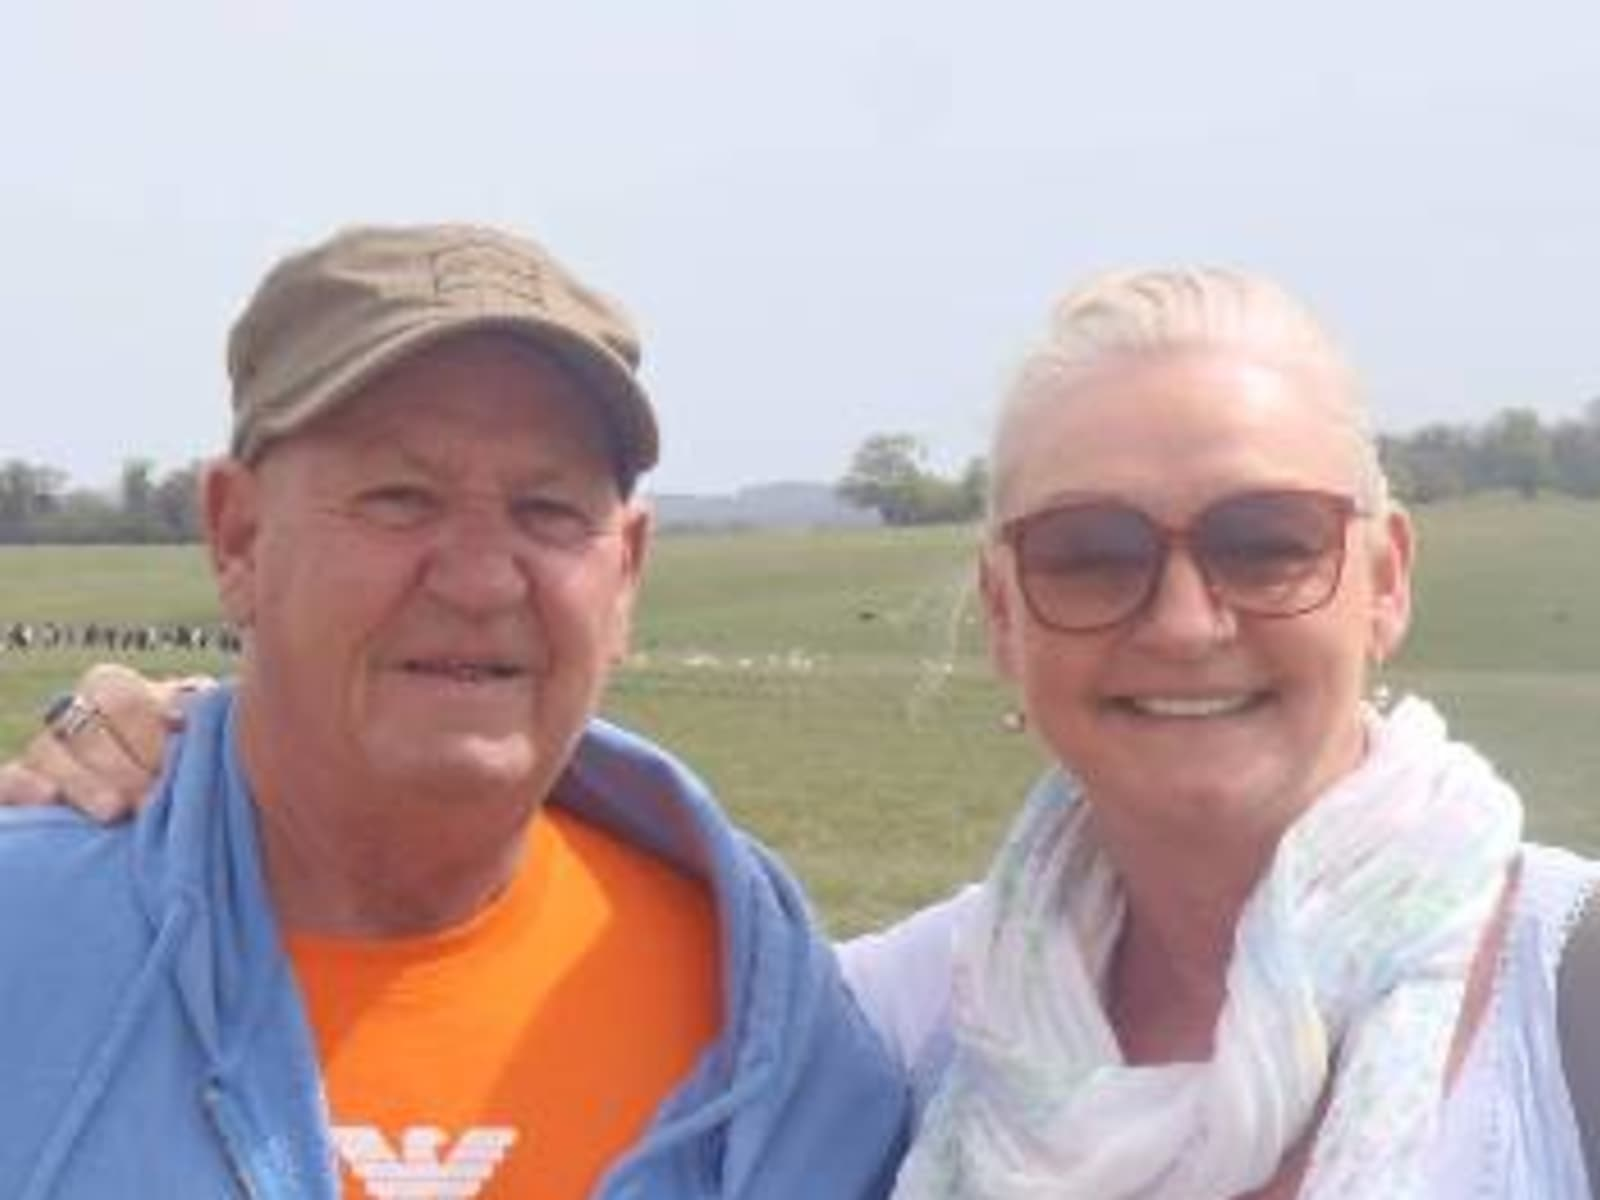 Joanne & Gary from Launceston, Tasmania, Australia